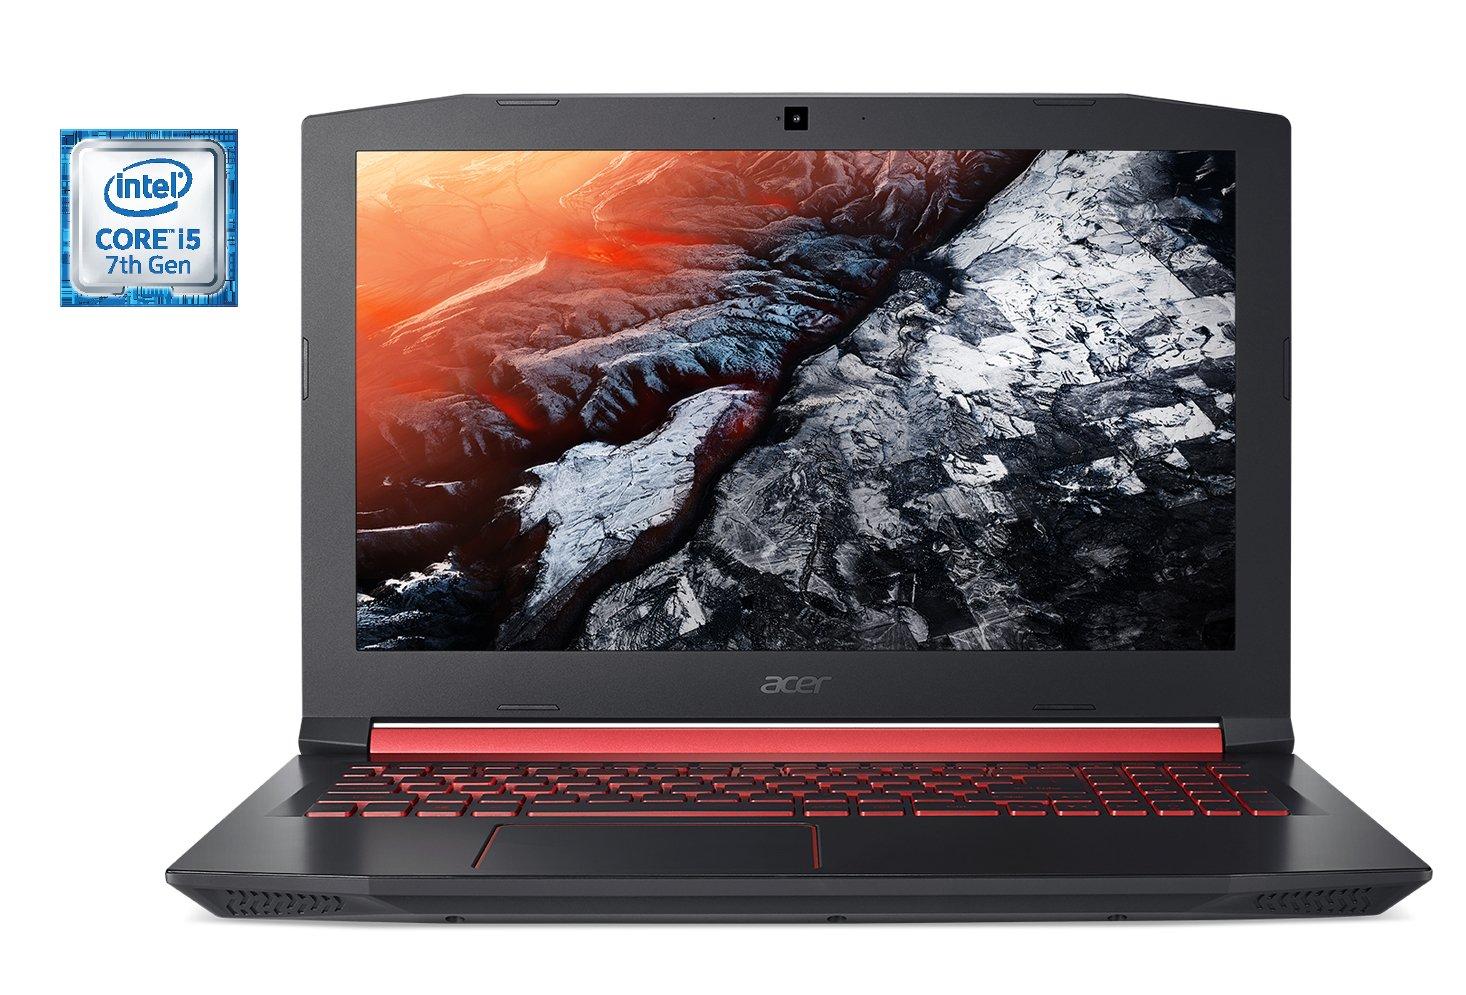 Acer Nitro 5 Gaming Laptop, Intel Core i5-7300HQ, GeForce GTX 1050 Ti, 15.6'' Full HD, 8GB DDR4, 256GB SSD, AN515-51-55WL by Acer